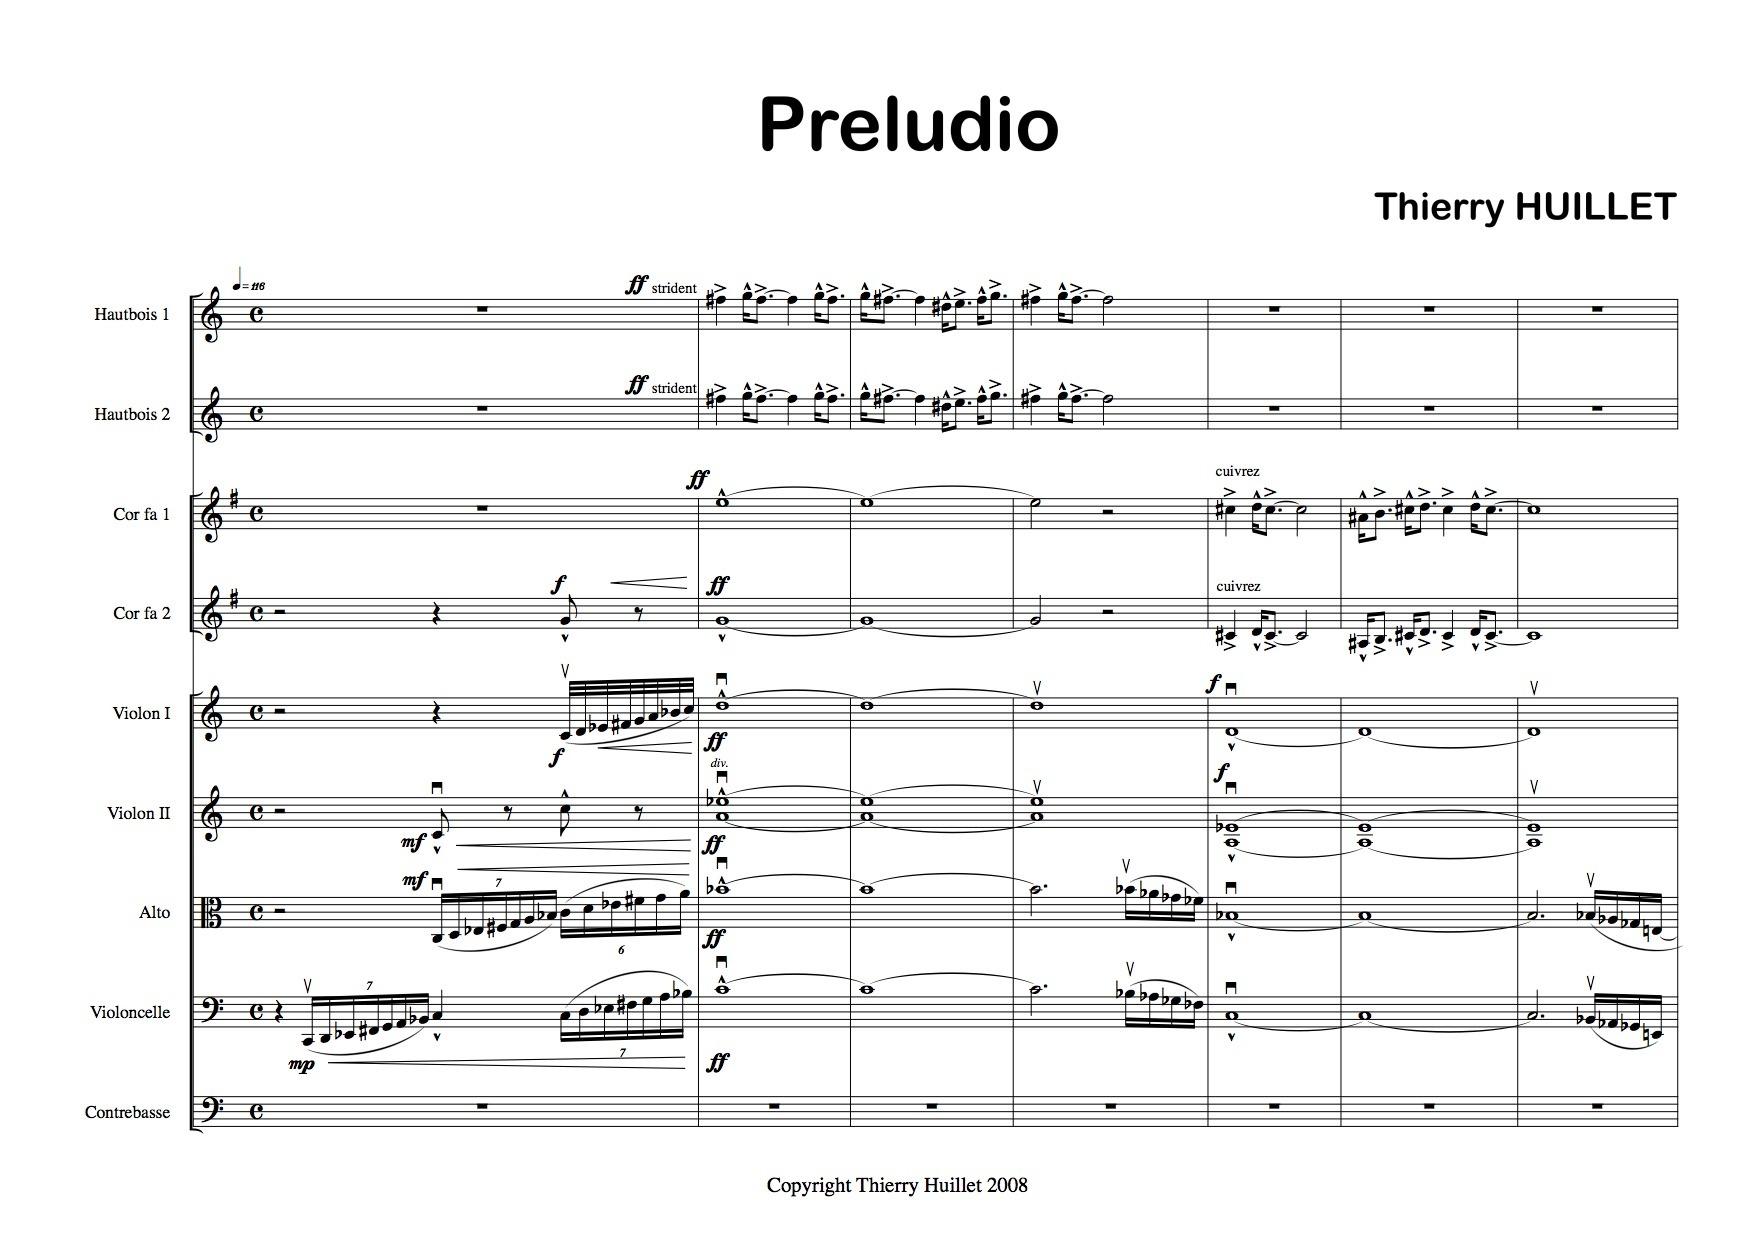 Thierry Huillet Preludio Scoreparts2